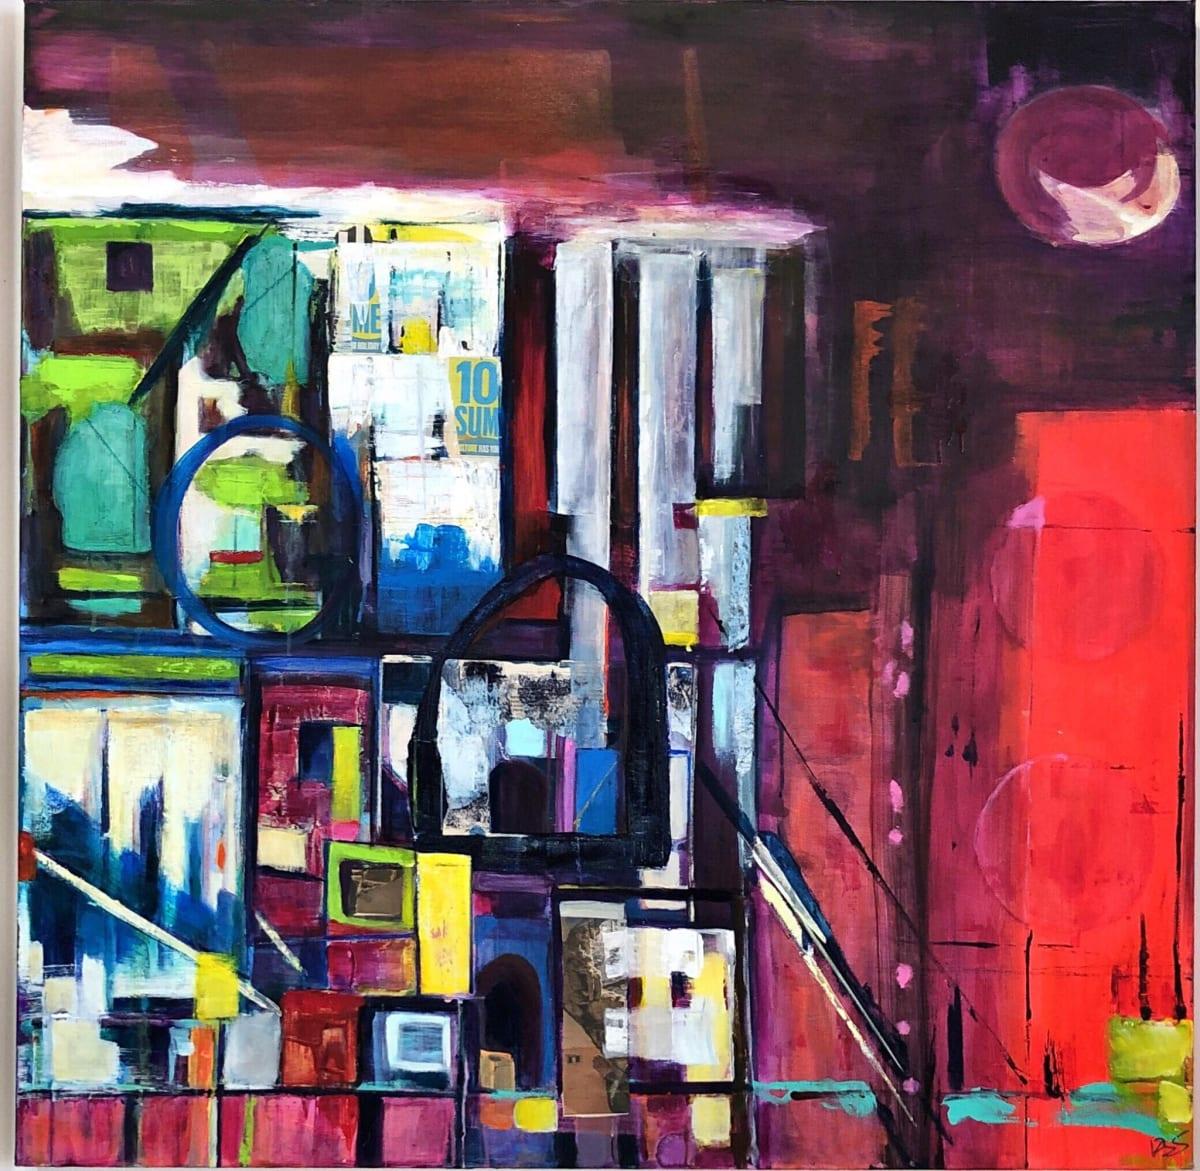 Putney School of Art and Design, Kira Behnert, London at Night